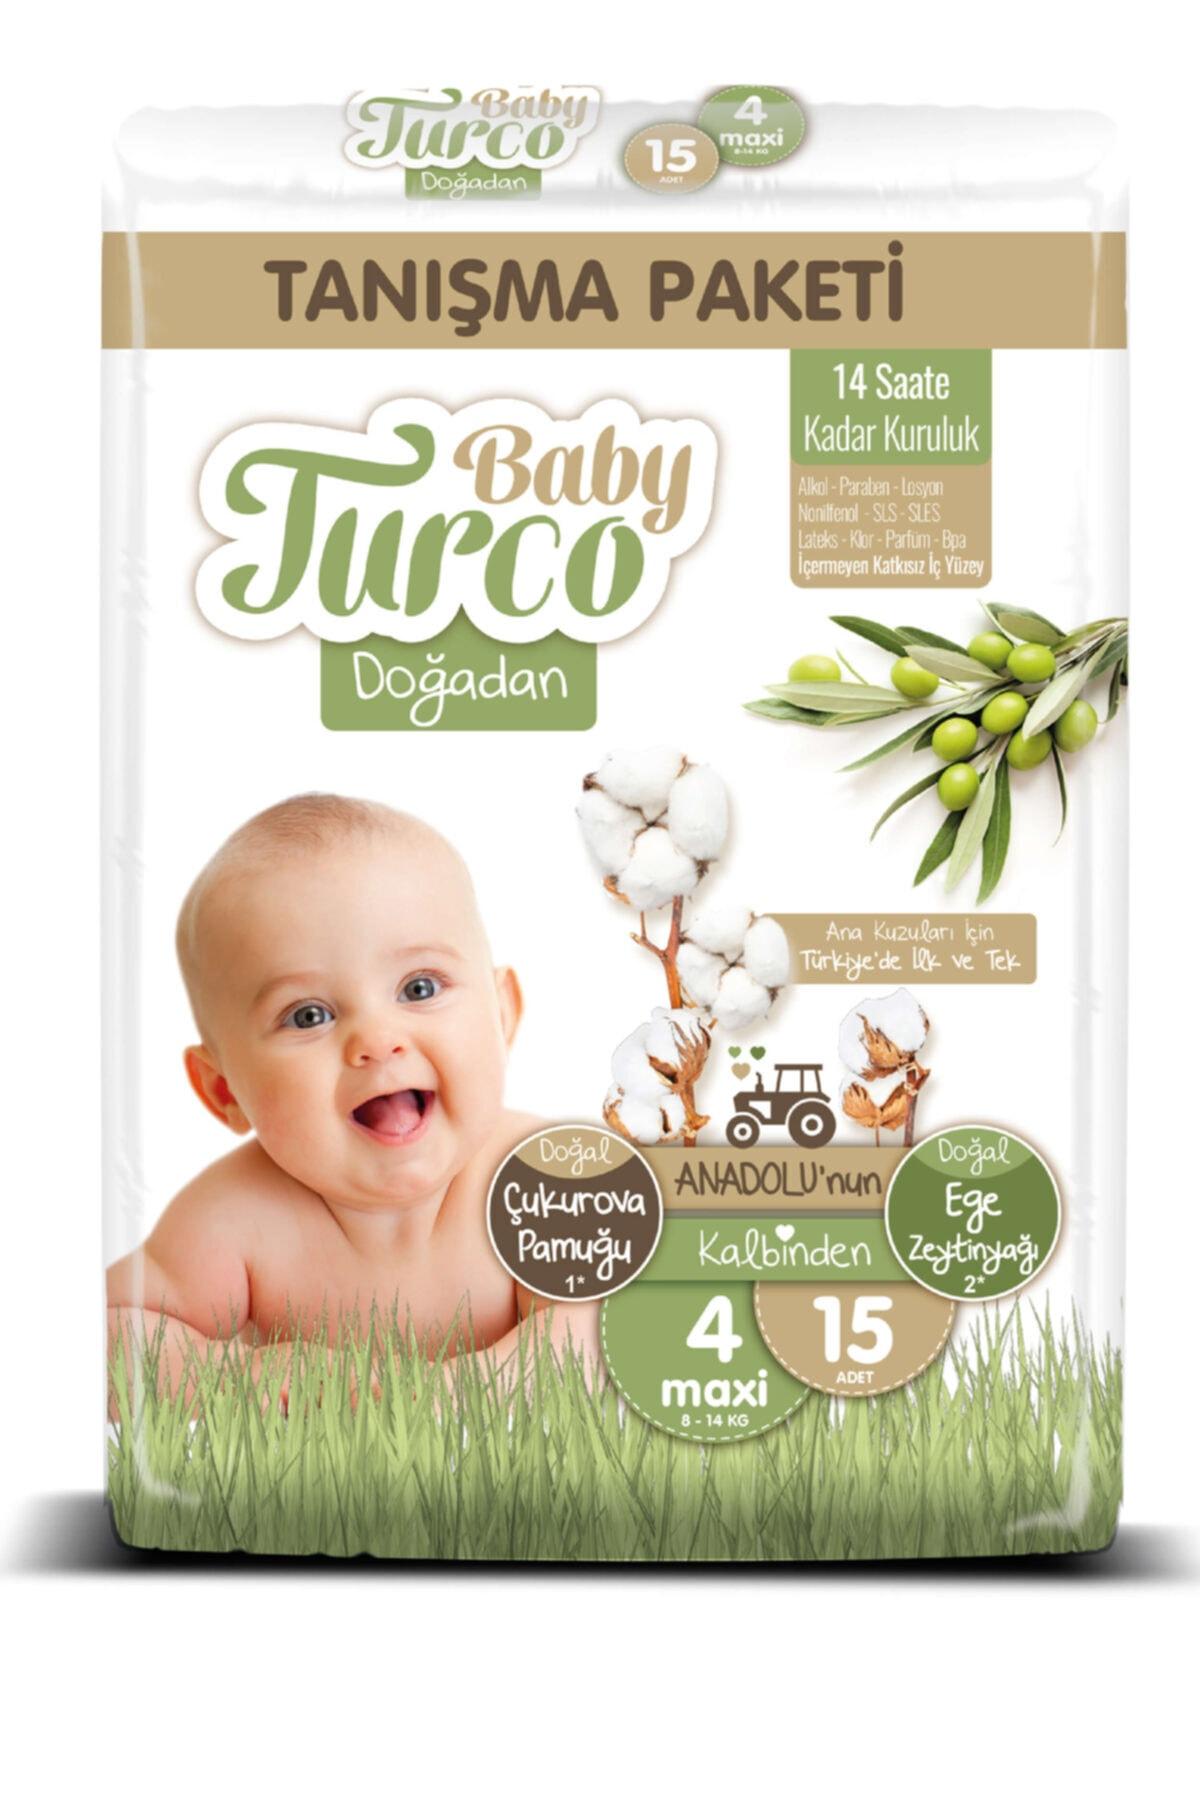 Baby Turco Doğadan 4 Numara Maxi Tanışma Paketi 15 Adet 2